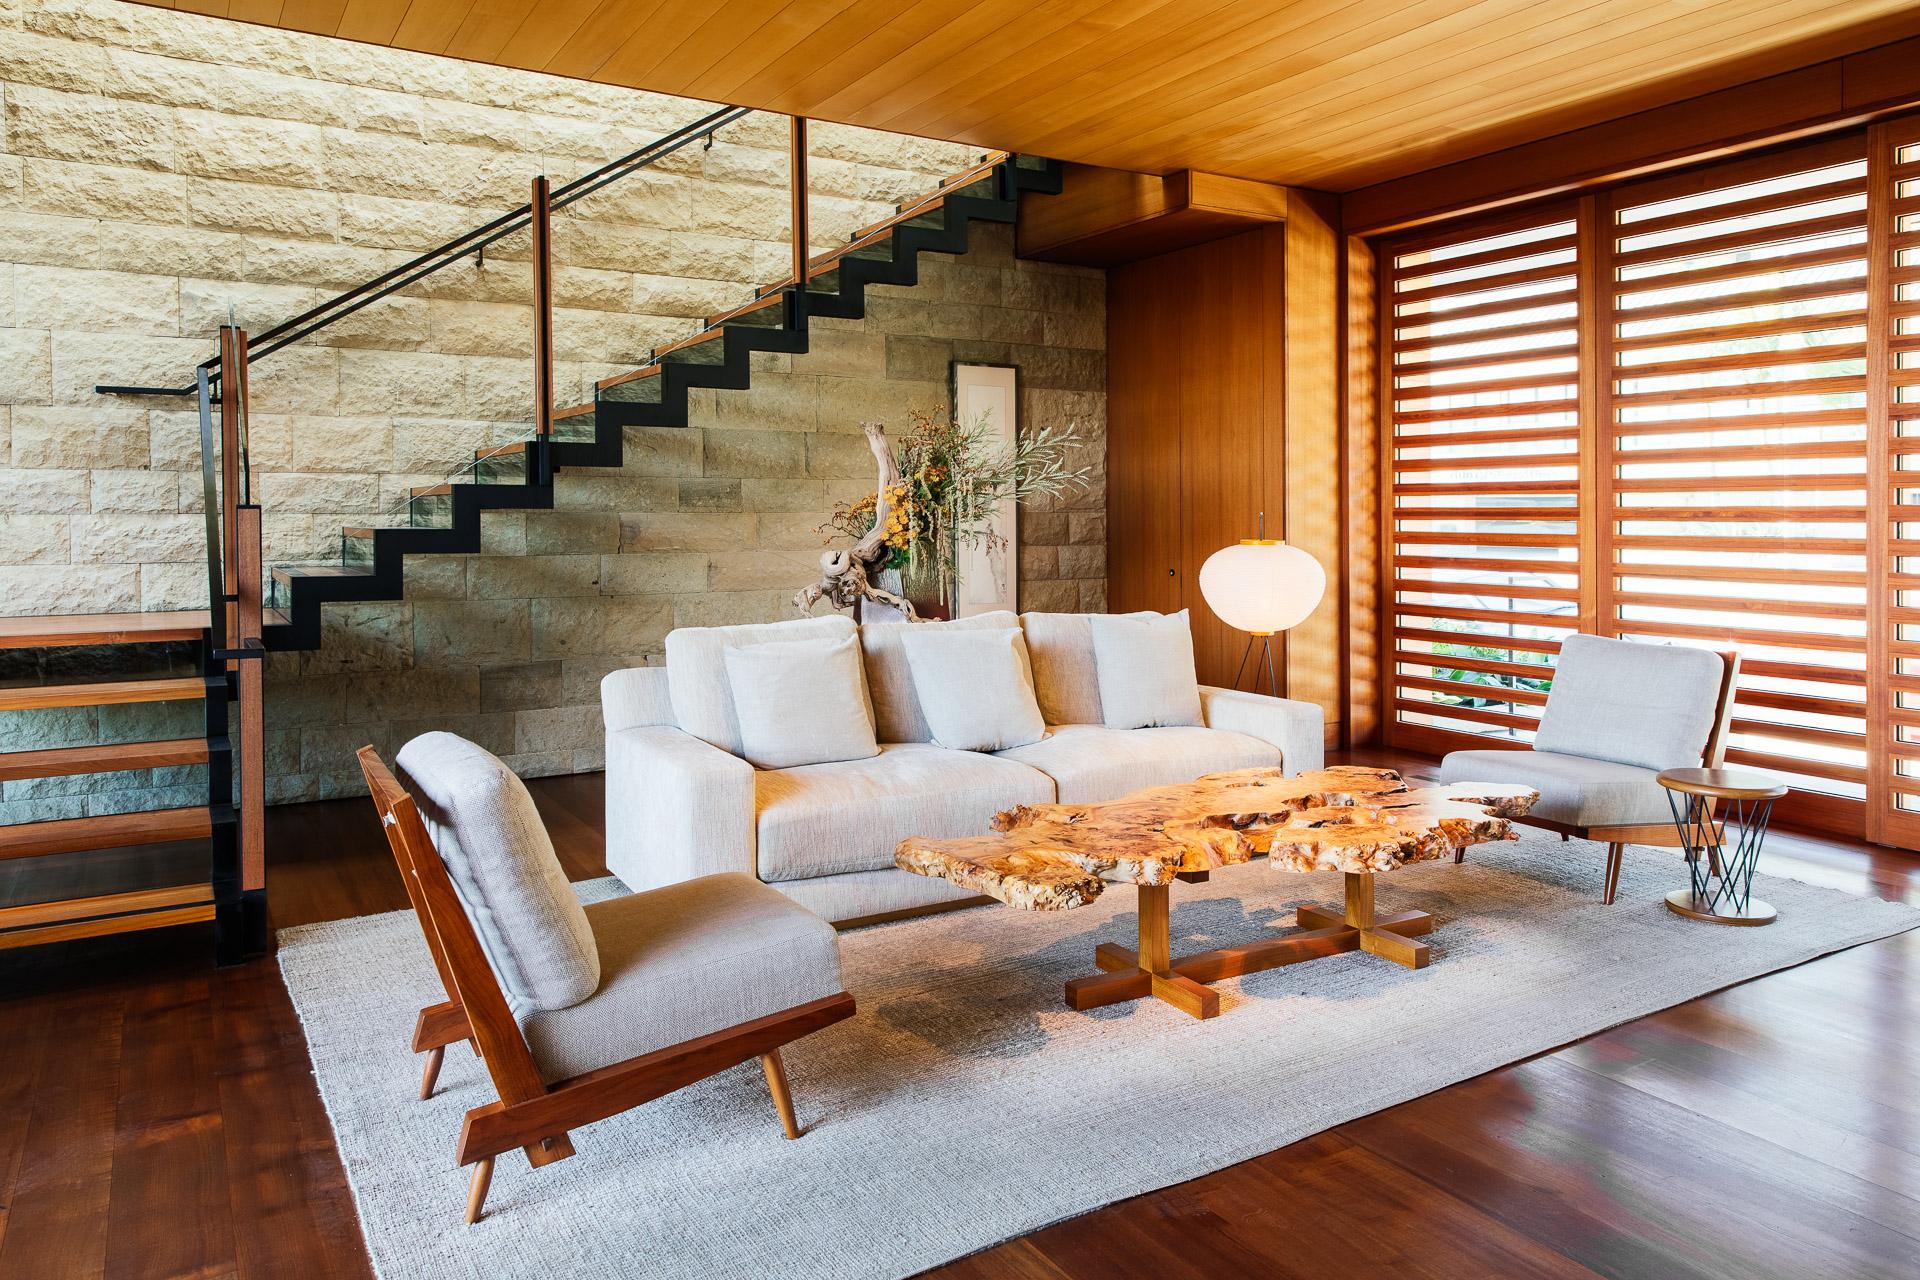 nobu-ryokan-malibu-california-luxury-hotel-photographer-los-angeles-2.jpg